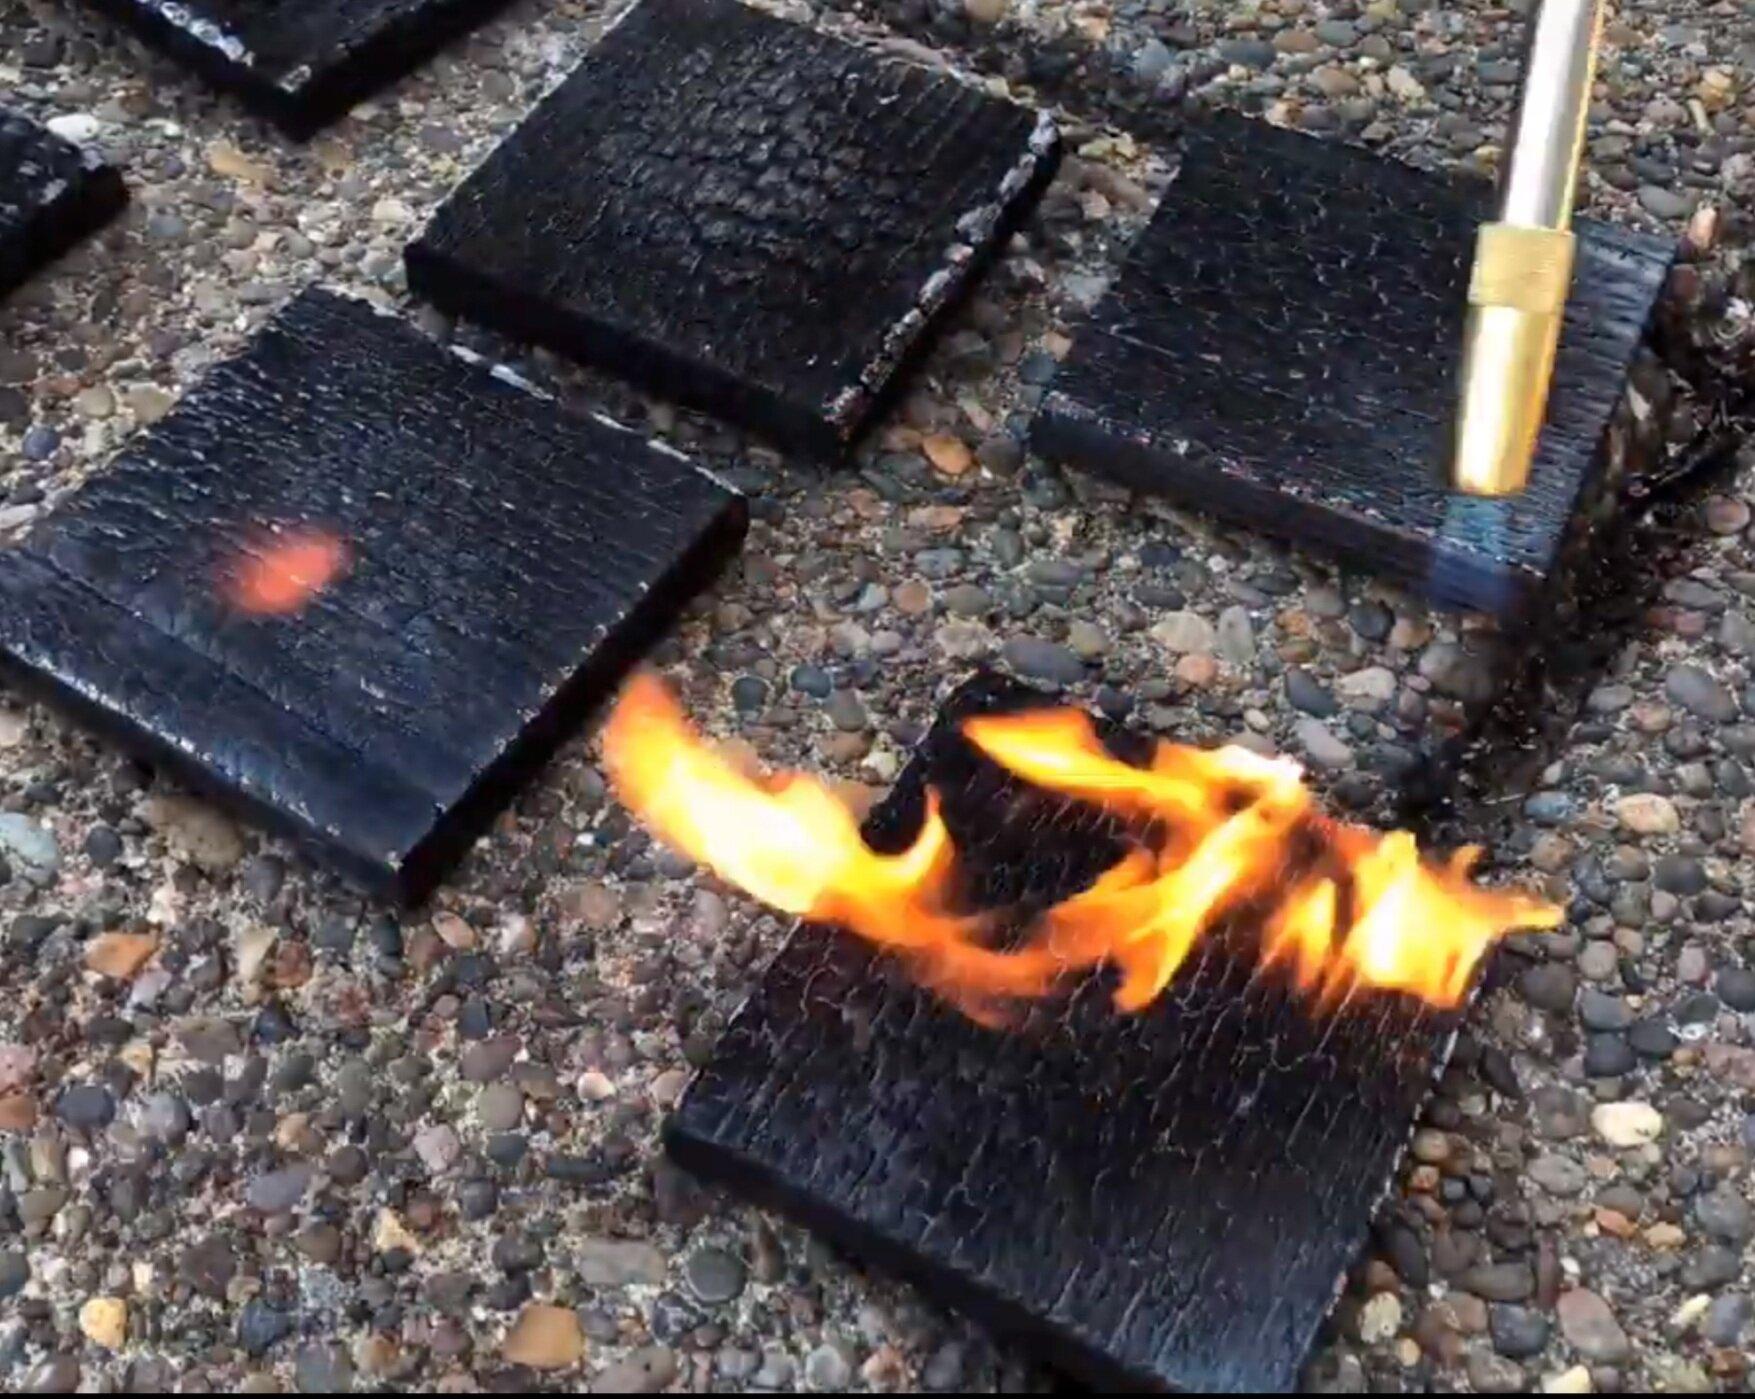 Epoxy Shou Sugi Ban How To Make 3d Charred Wood